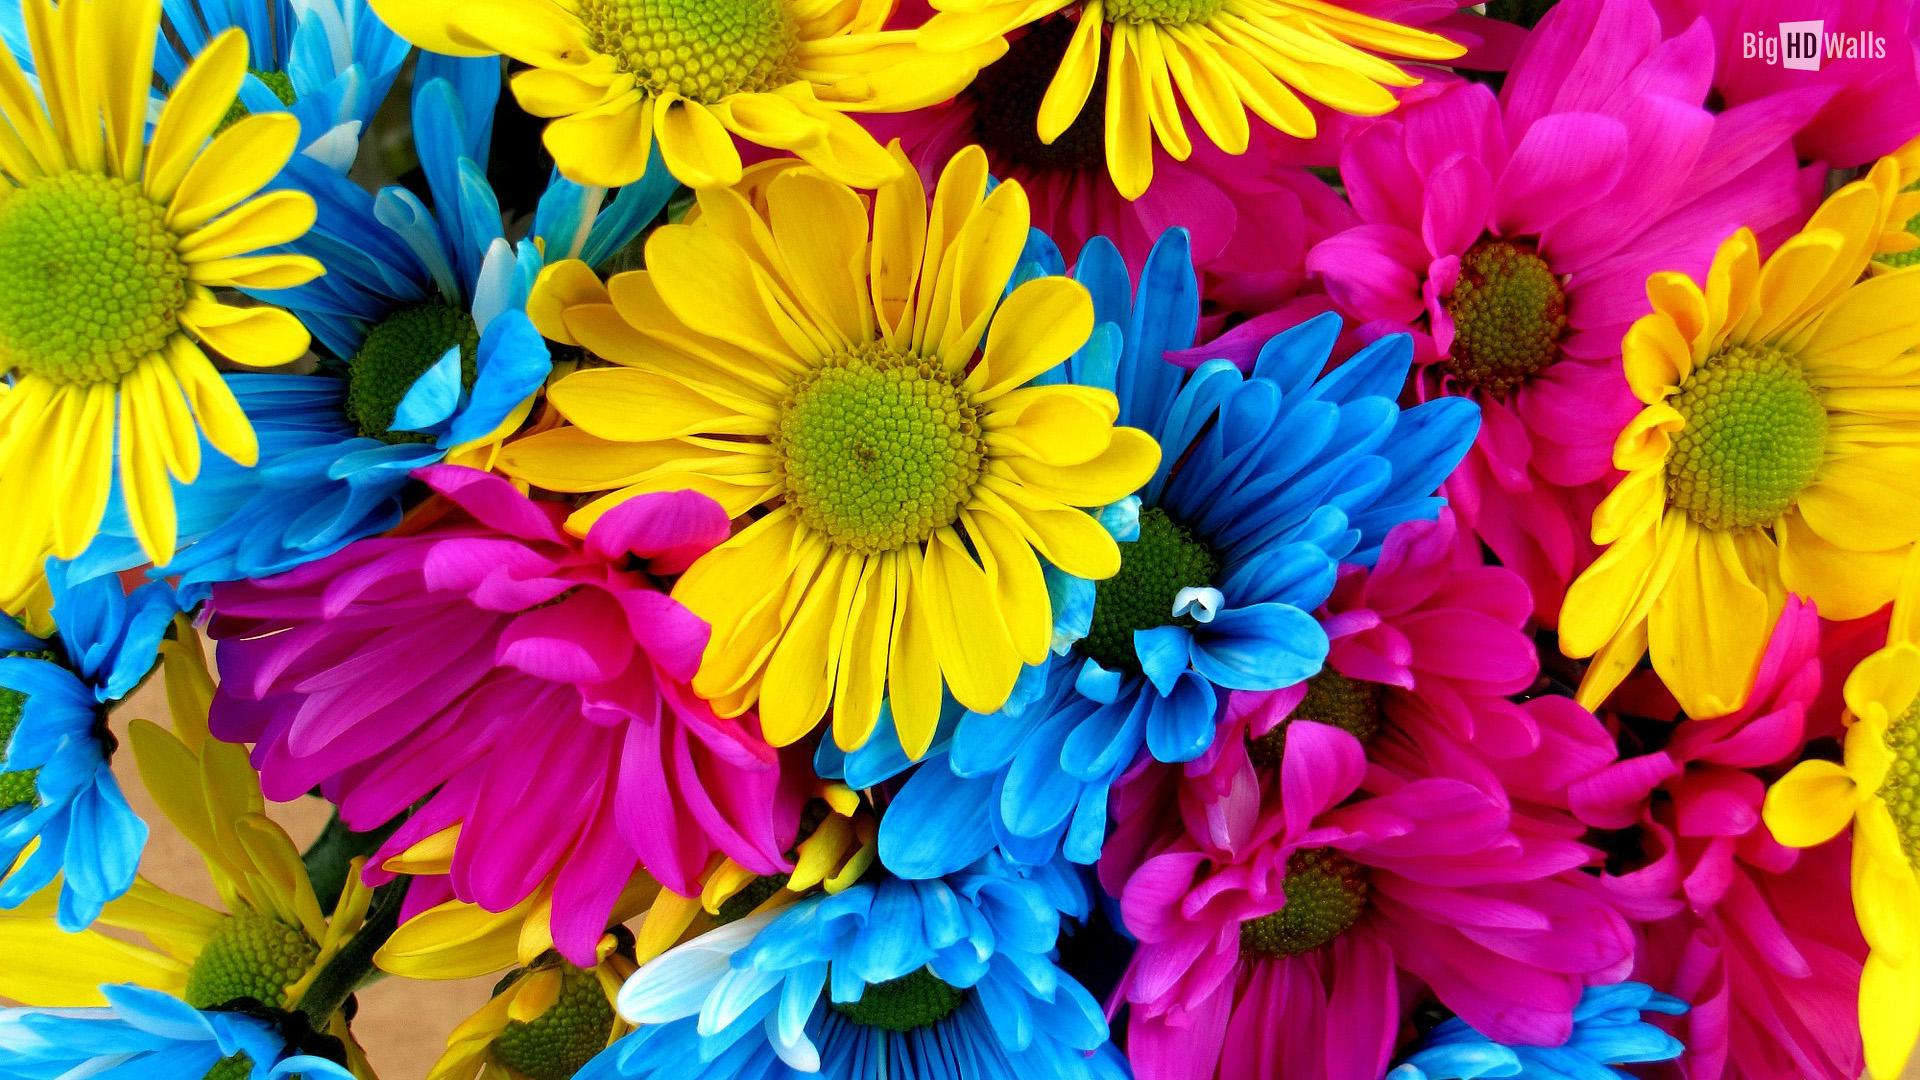 Free Colorful Flower Wallpaper Downloads: Gerber Daisy Desktop Wallpaper